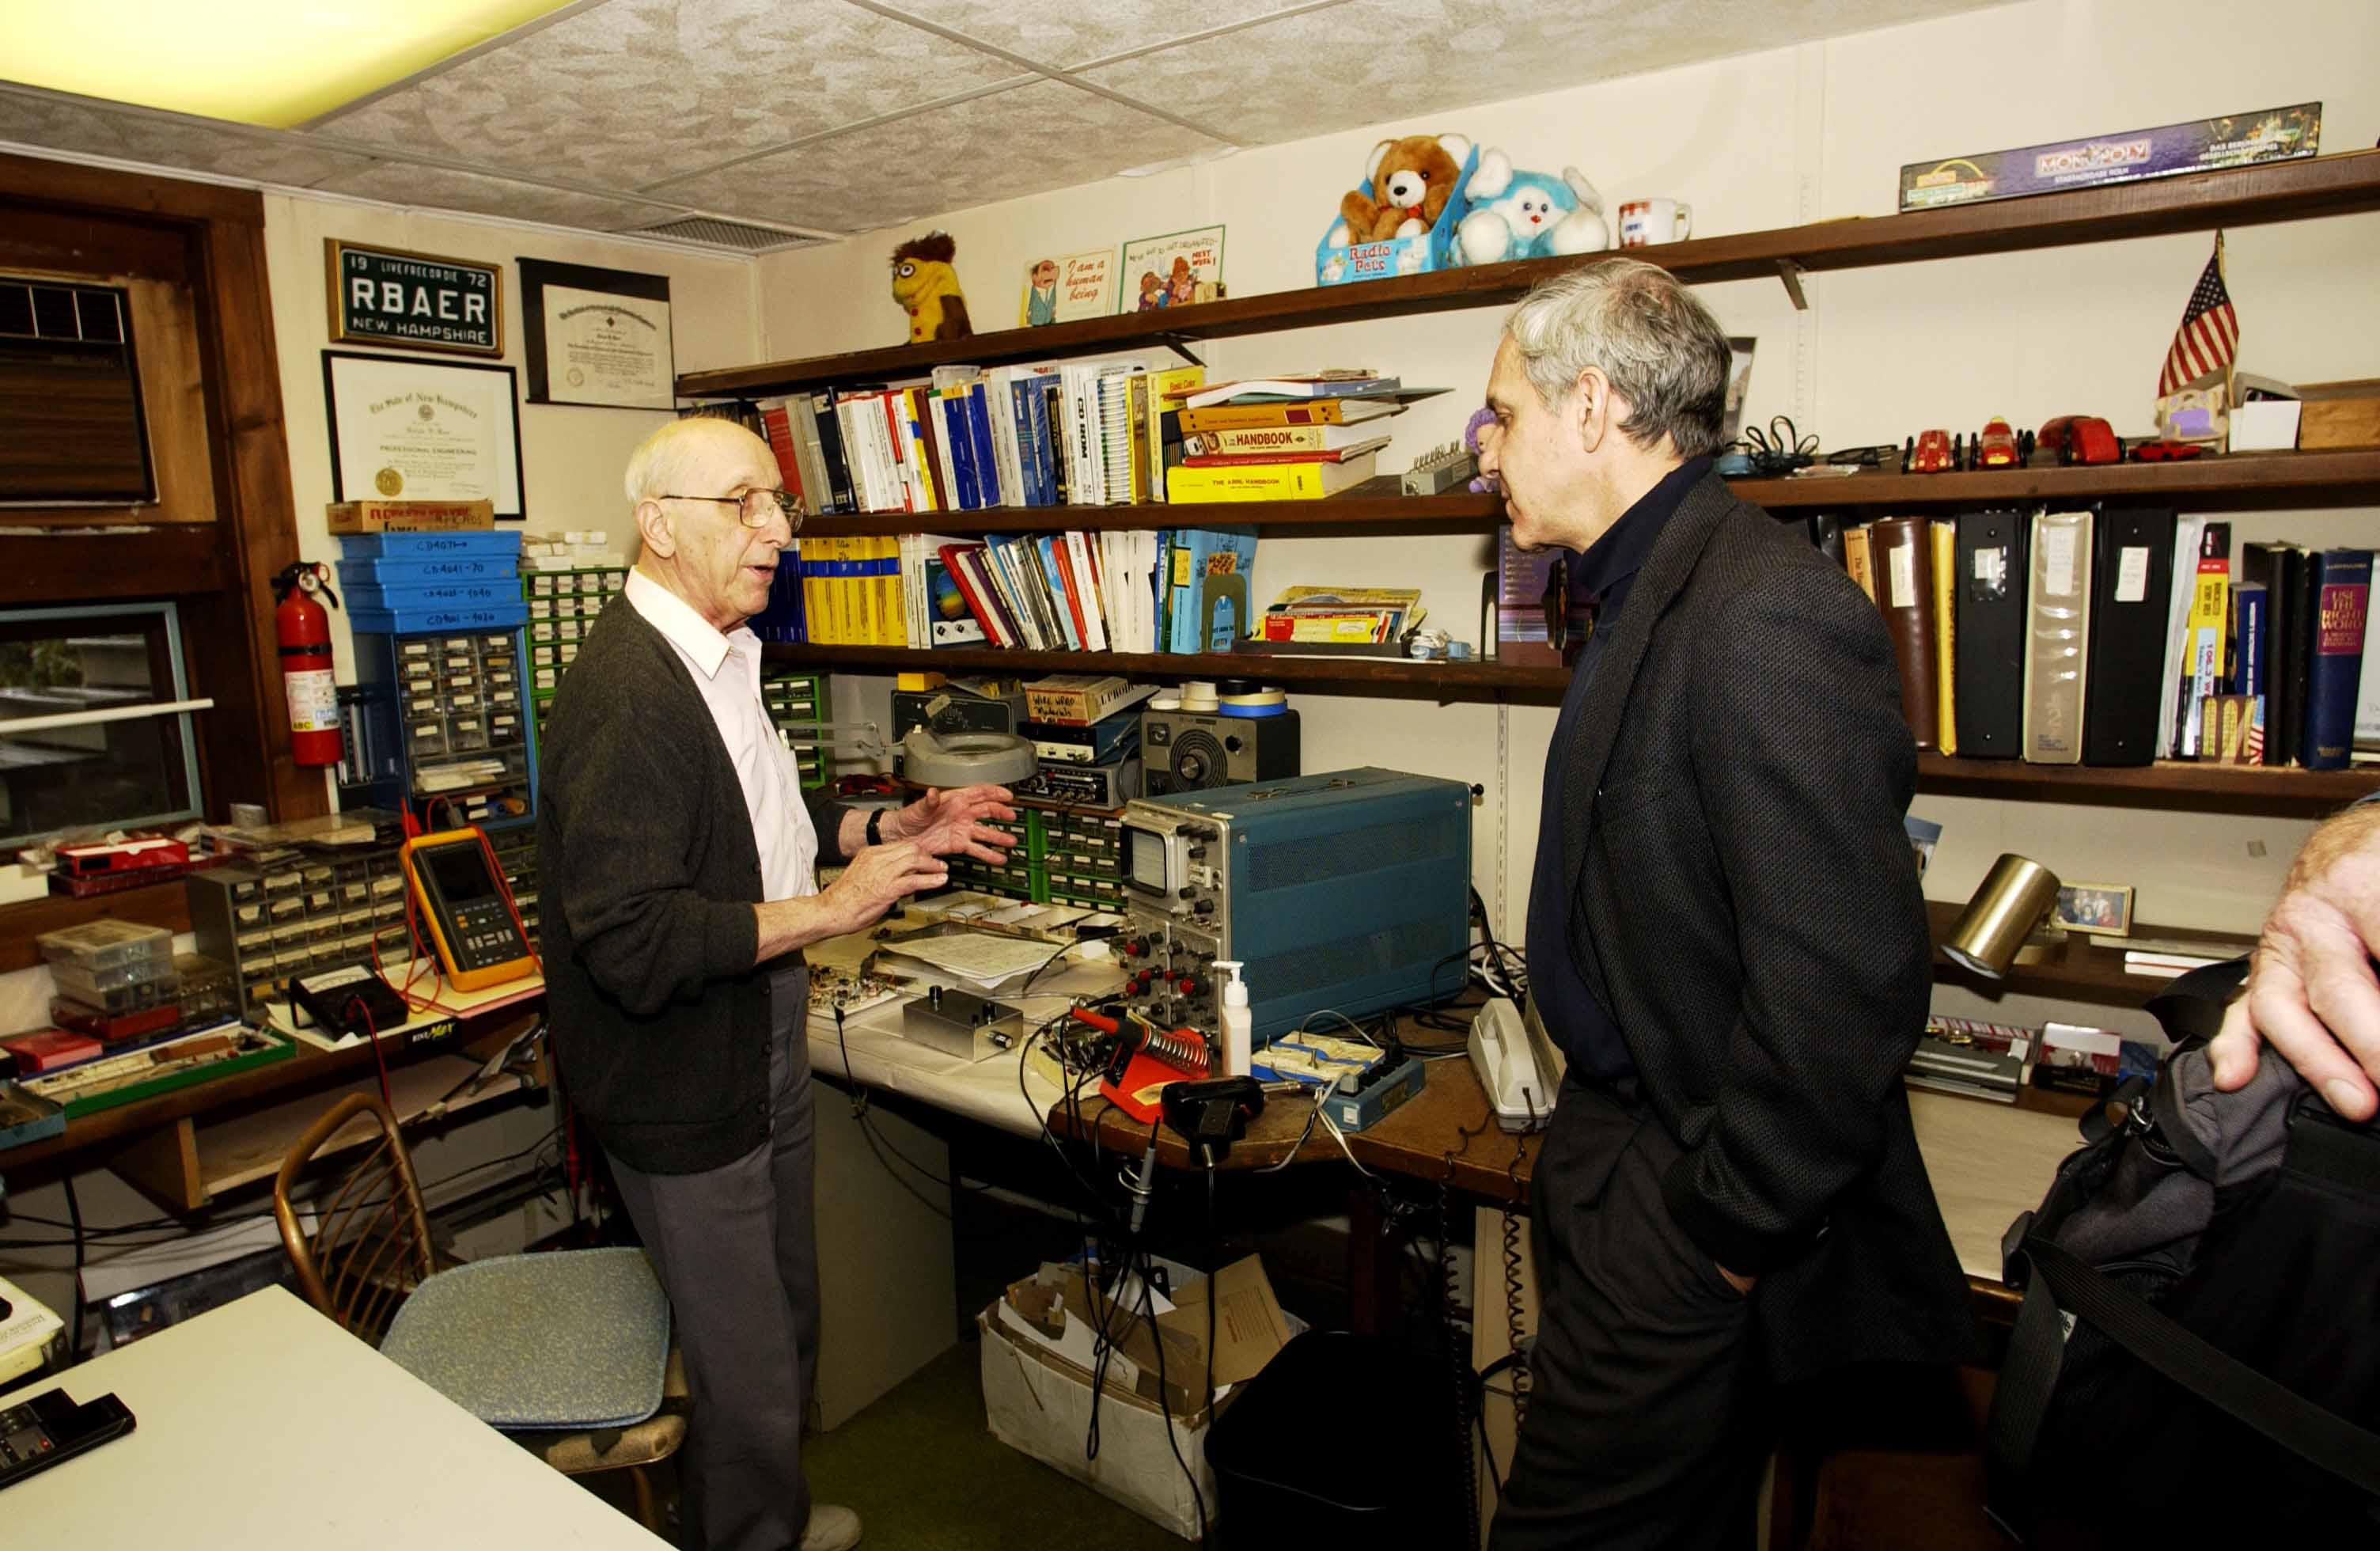 Video game inventor Ralph Baer shows Lemelson Center Director Art Molella his basement workshop.